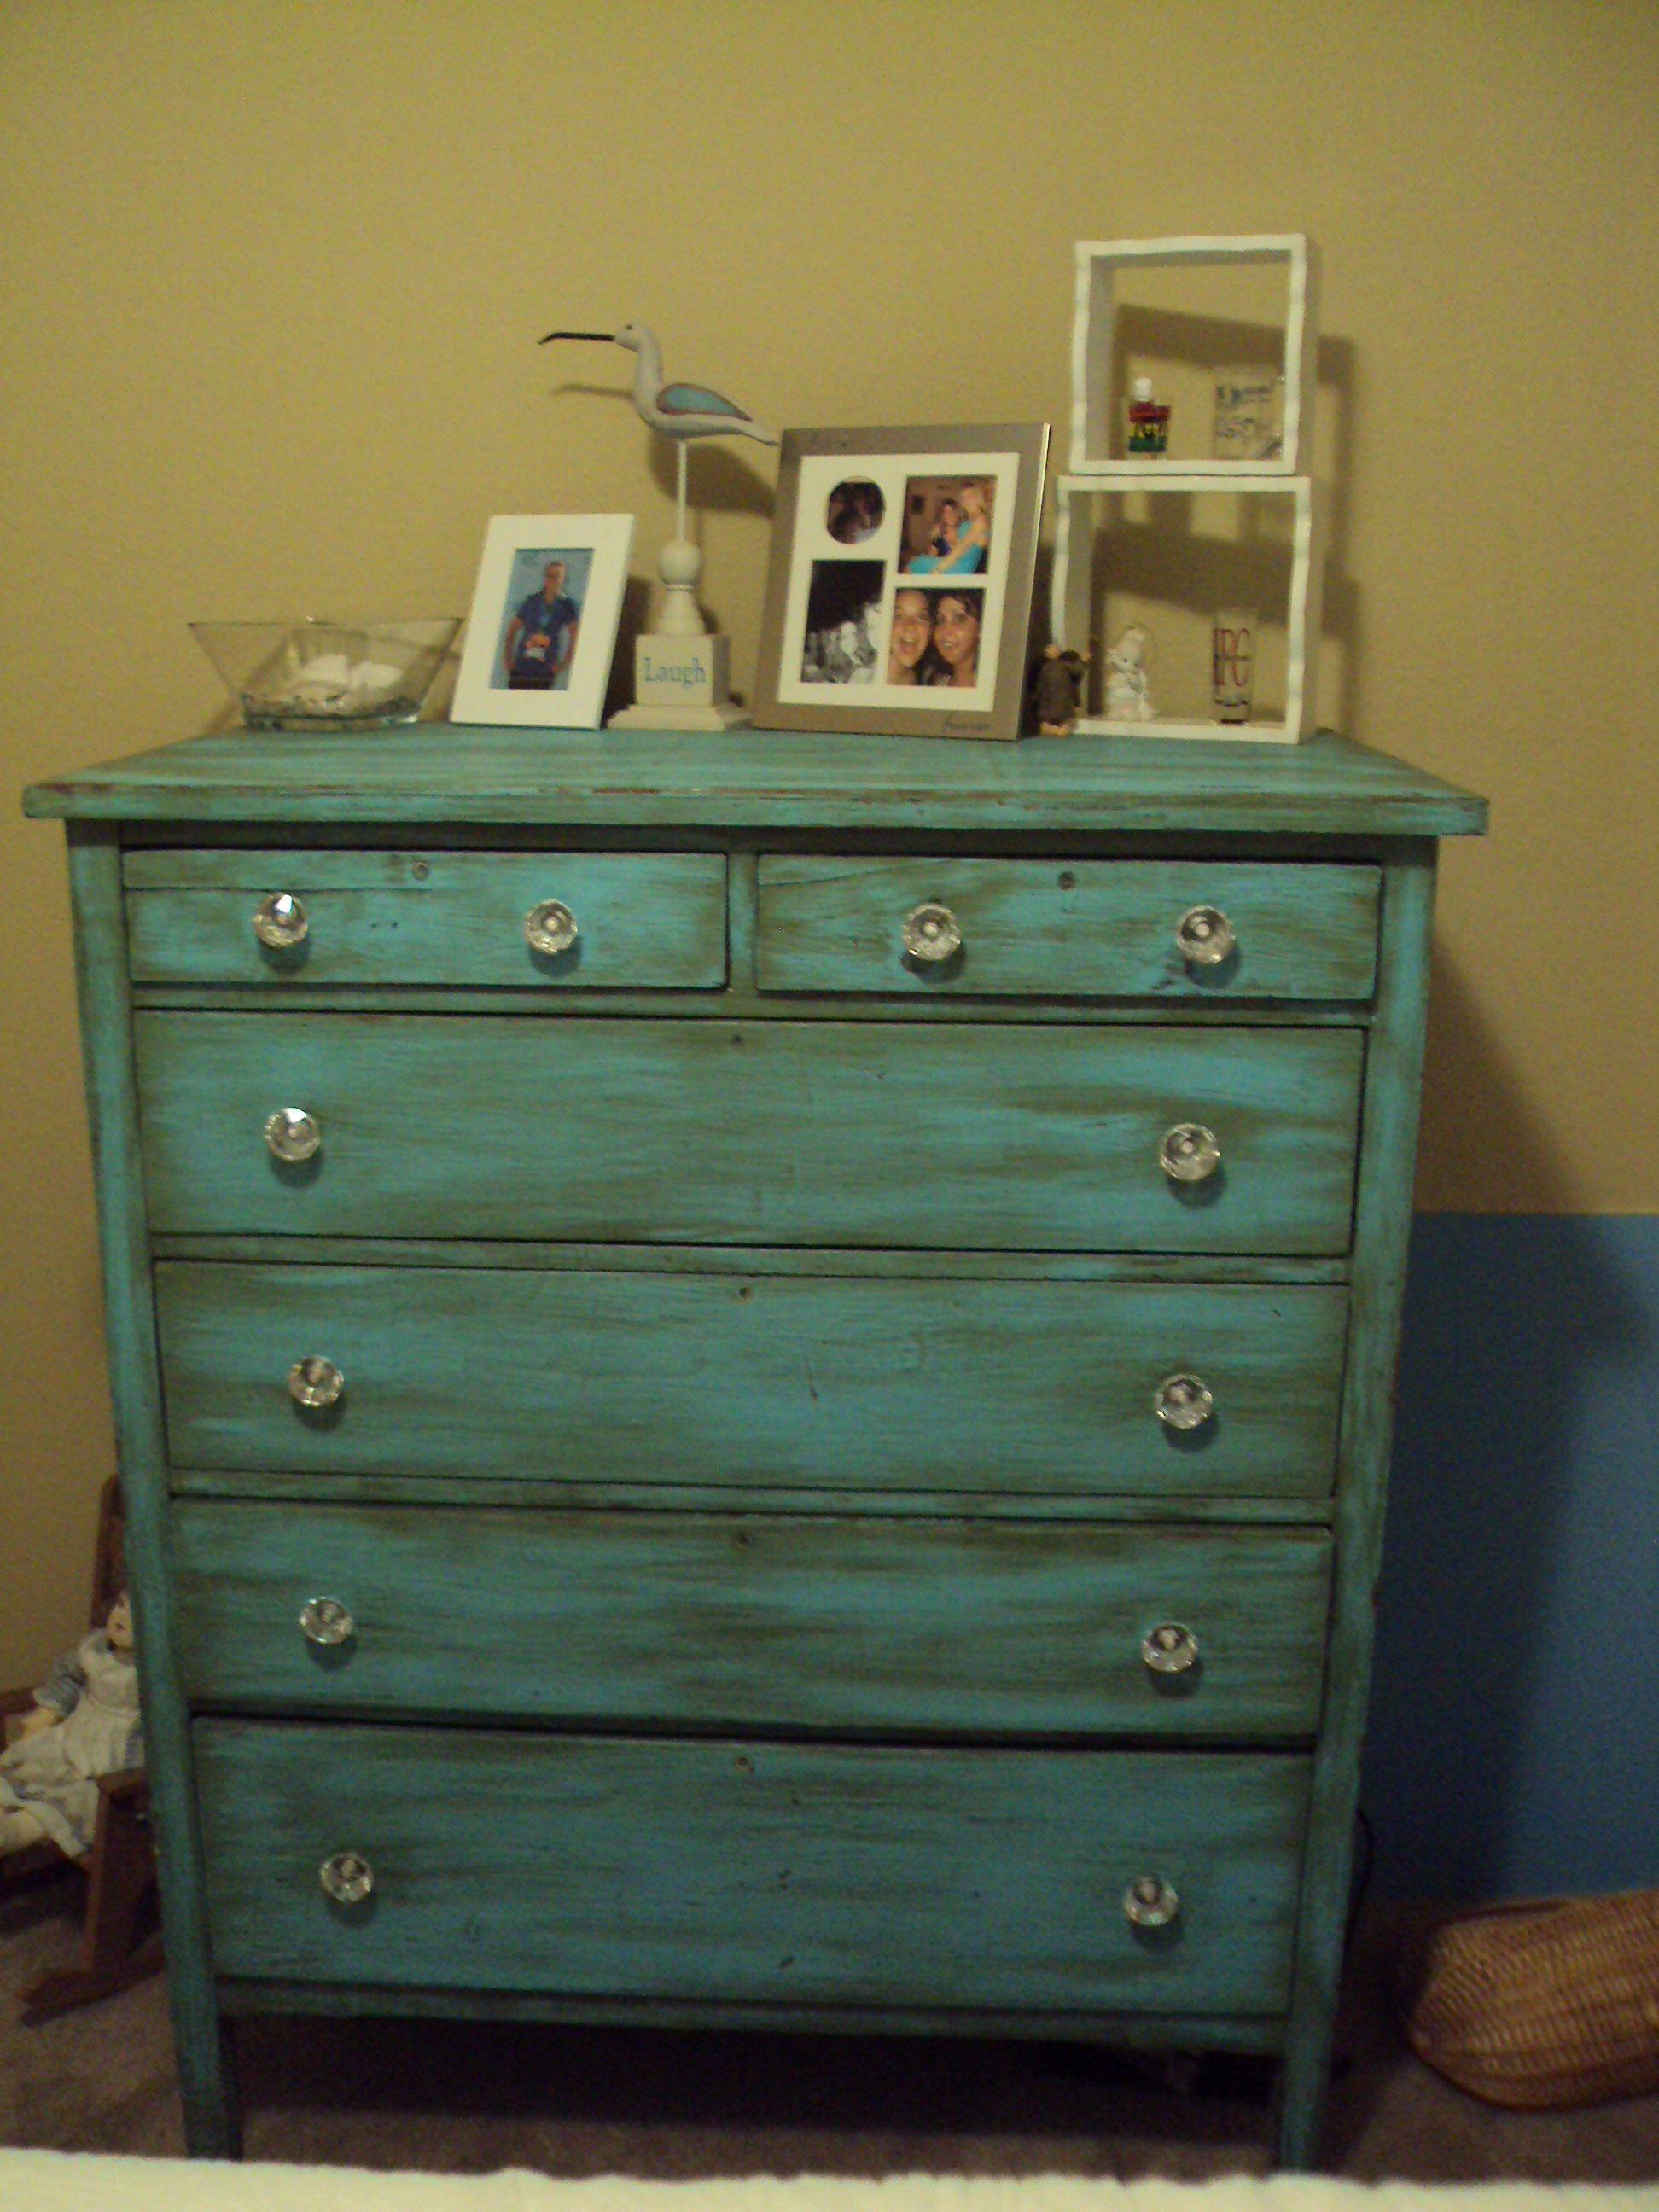 turquoise dresser envoyercommodeturquoise commodefinition de meublesmeubles peintsidees de meublesreorientescommodessarcelle